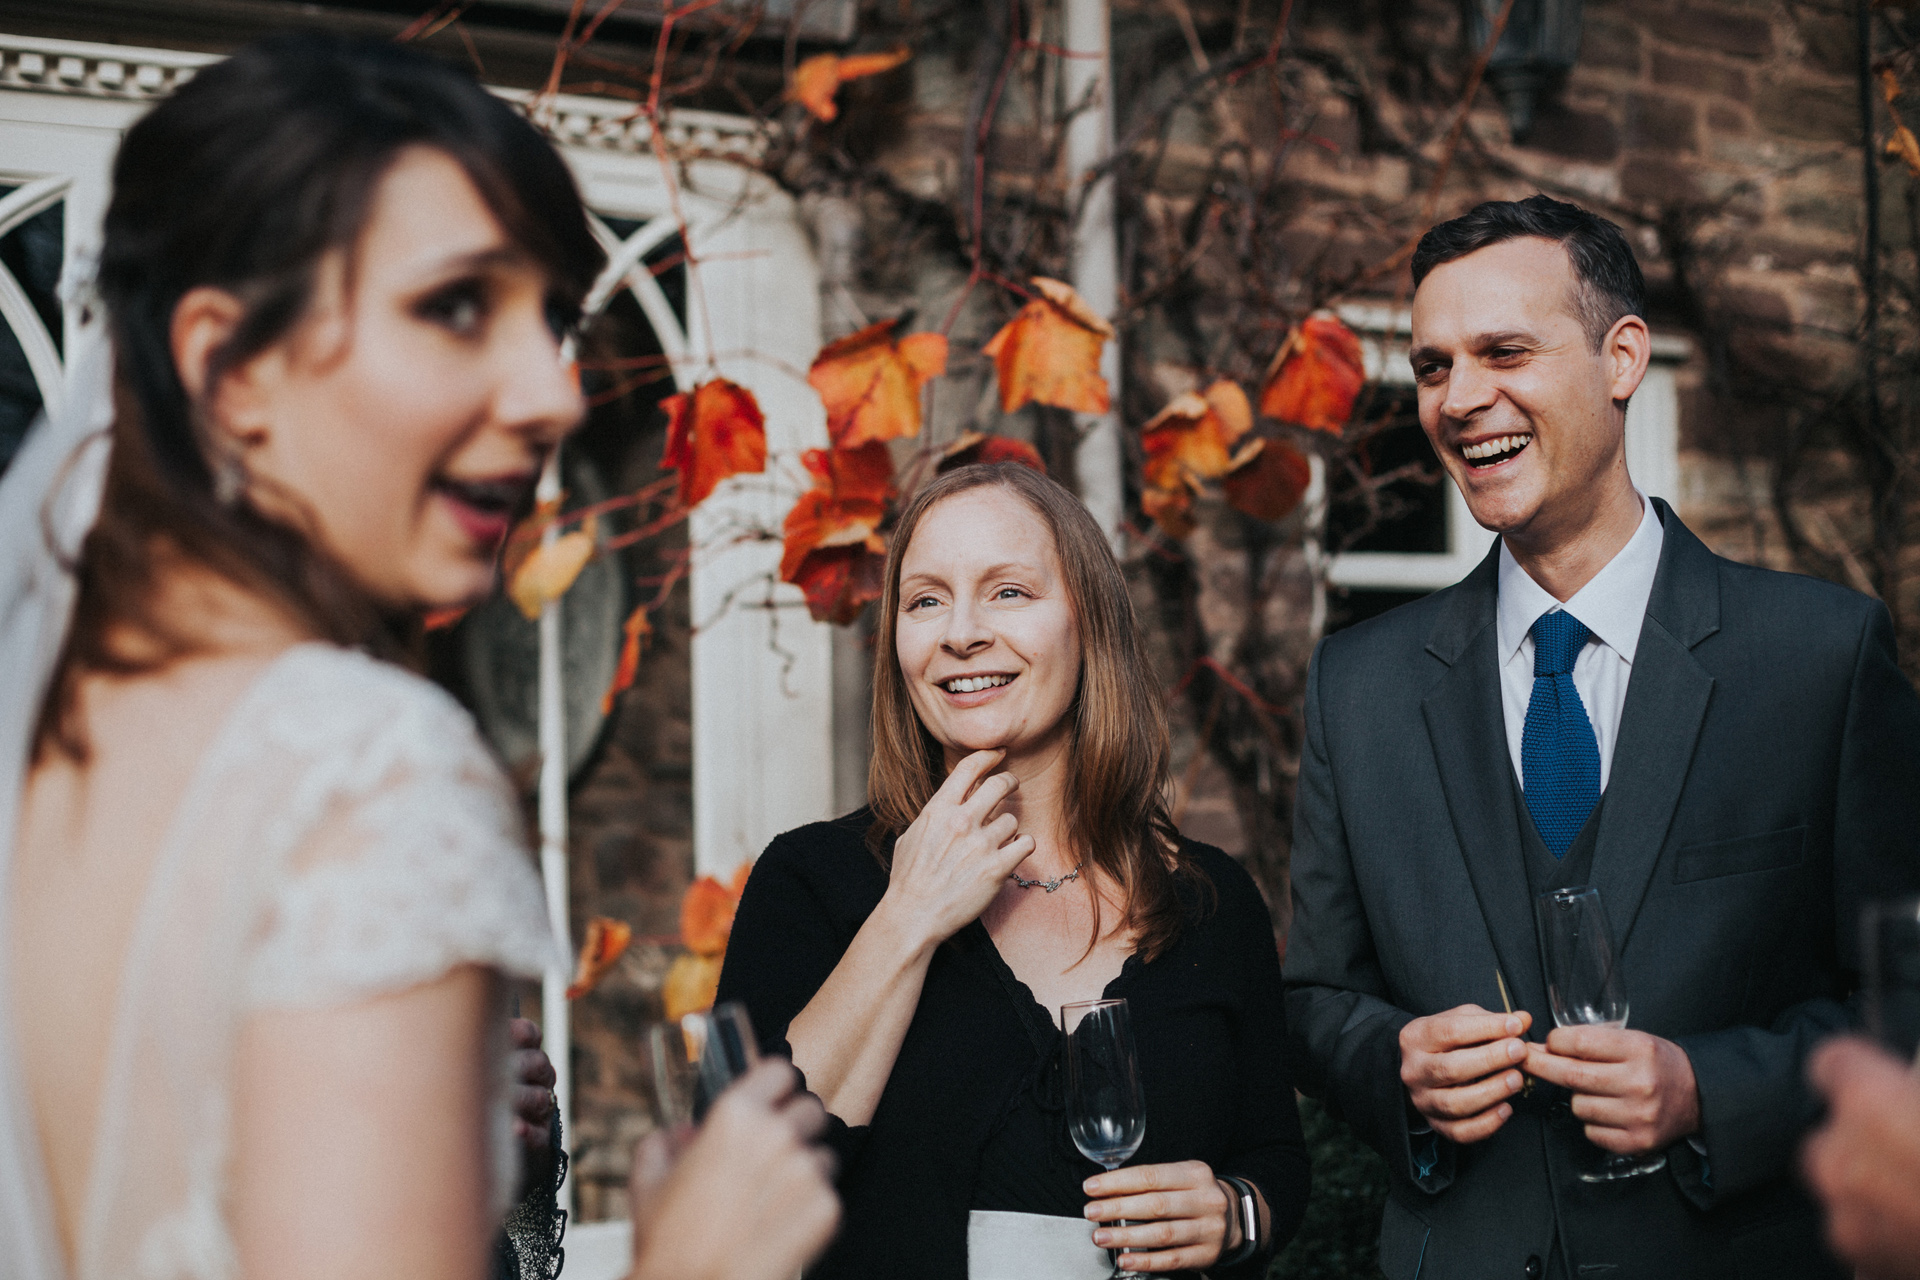 Bride and wedding guests.